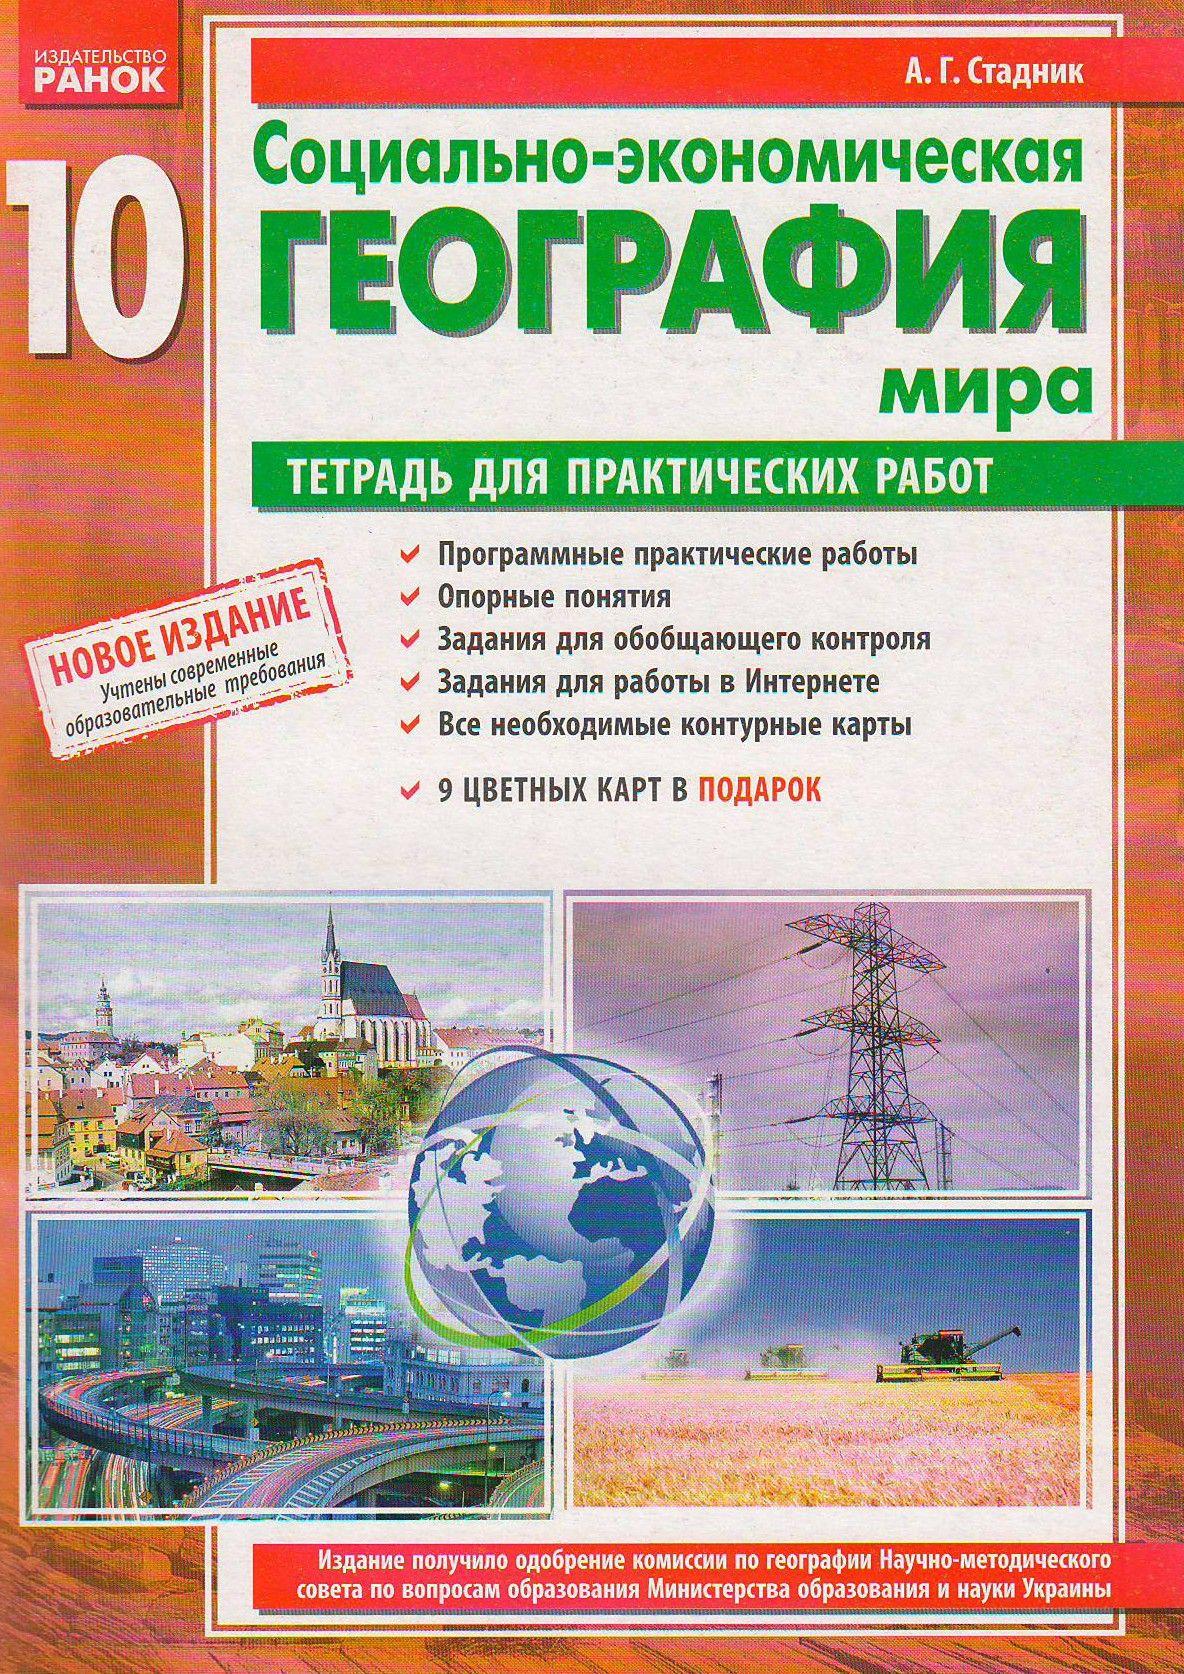 Гдз 5 класс по русскому языку г державин на сайте www.slovo.ws